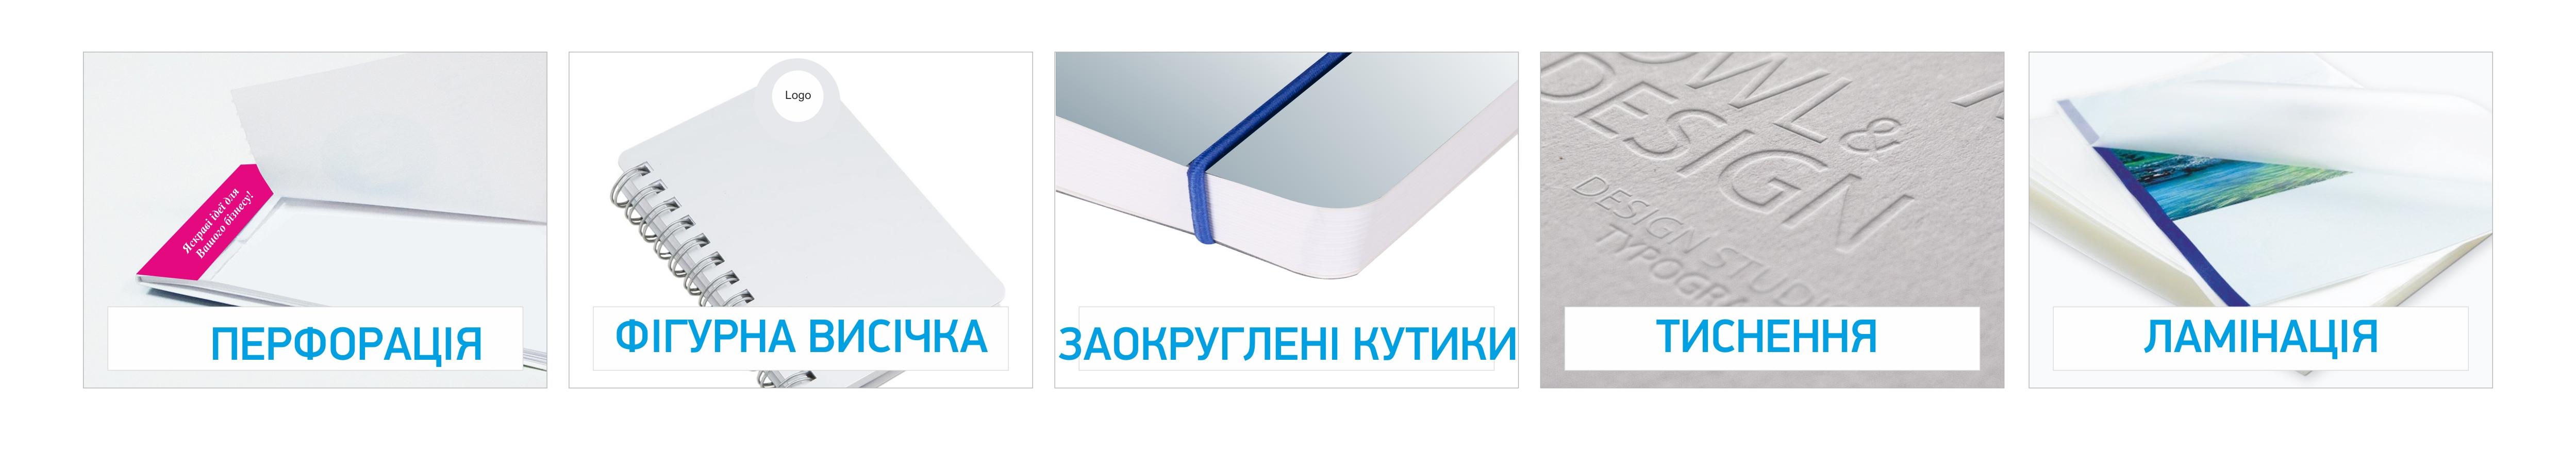 bloknot s logotipom_3